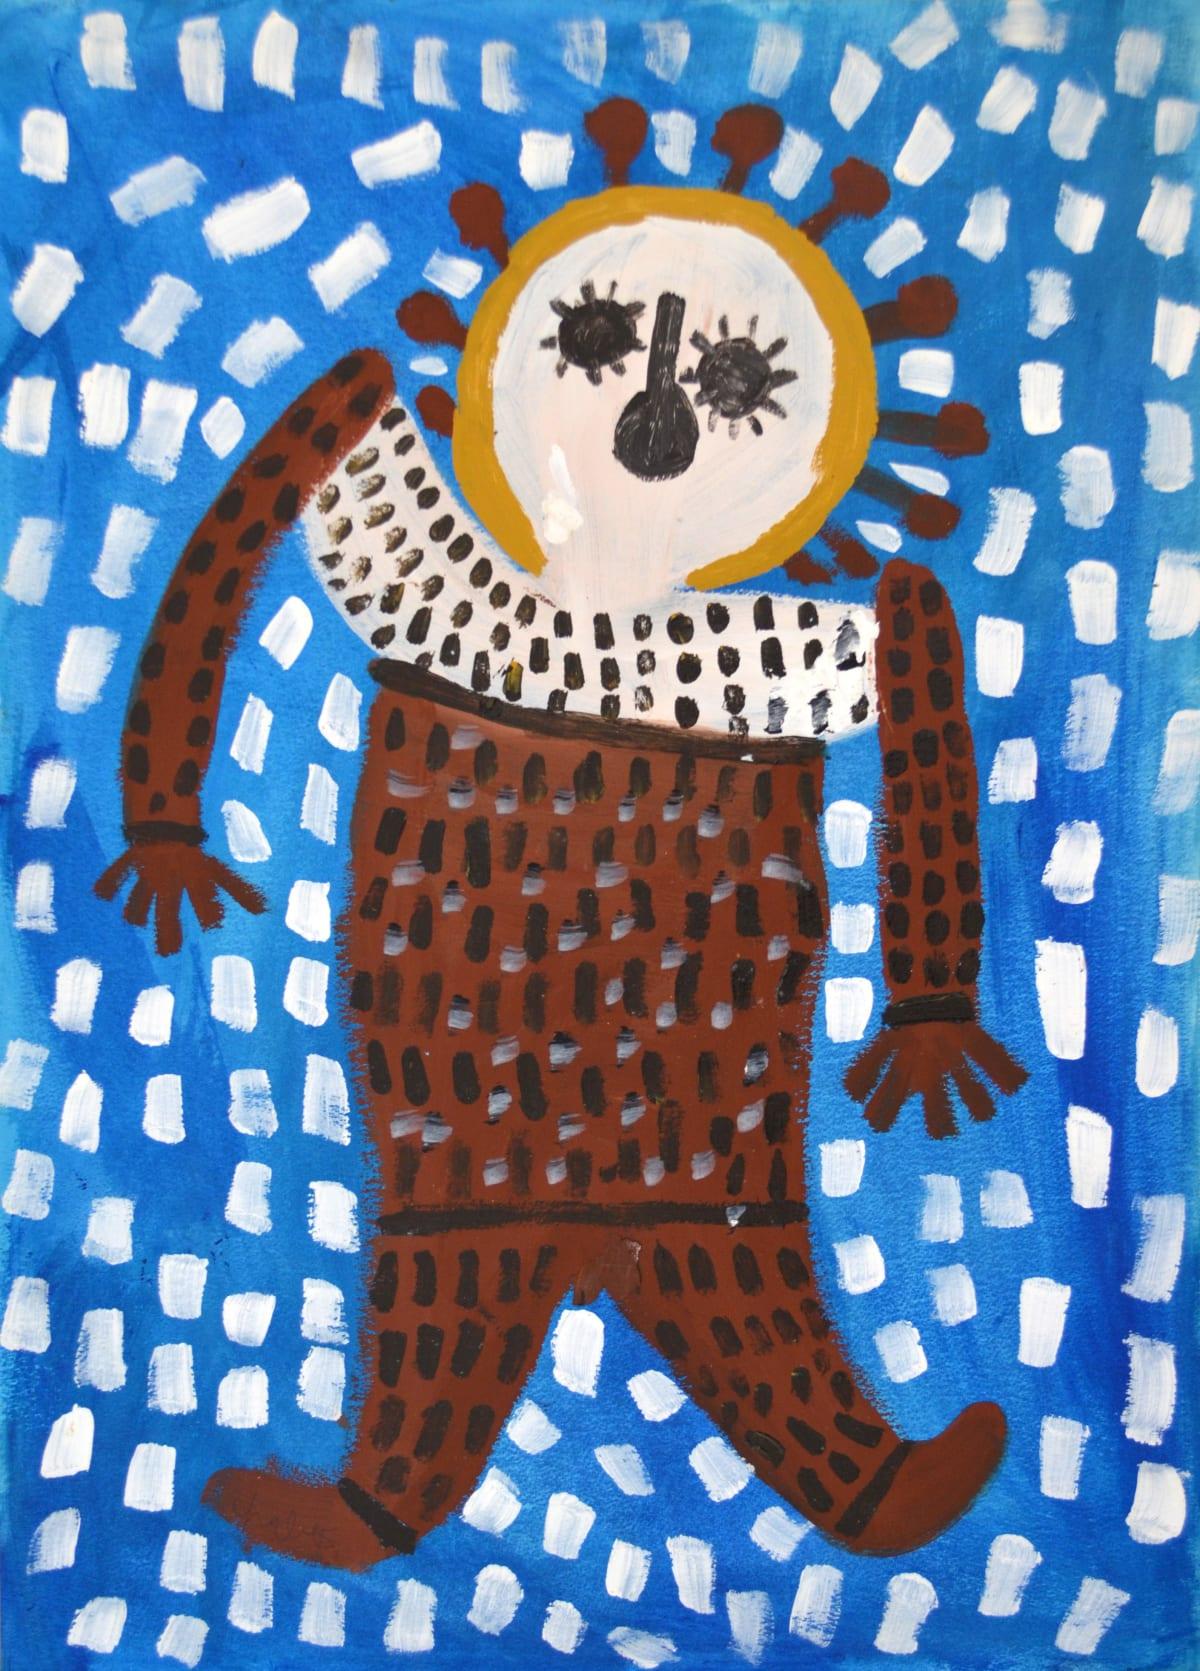 Mabel King Wandjina acrylic on paper 56 x 66 cm